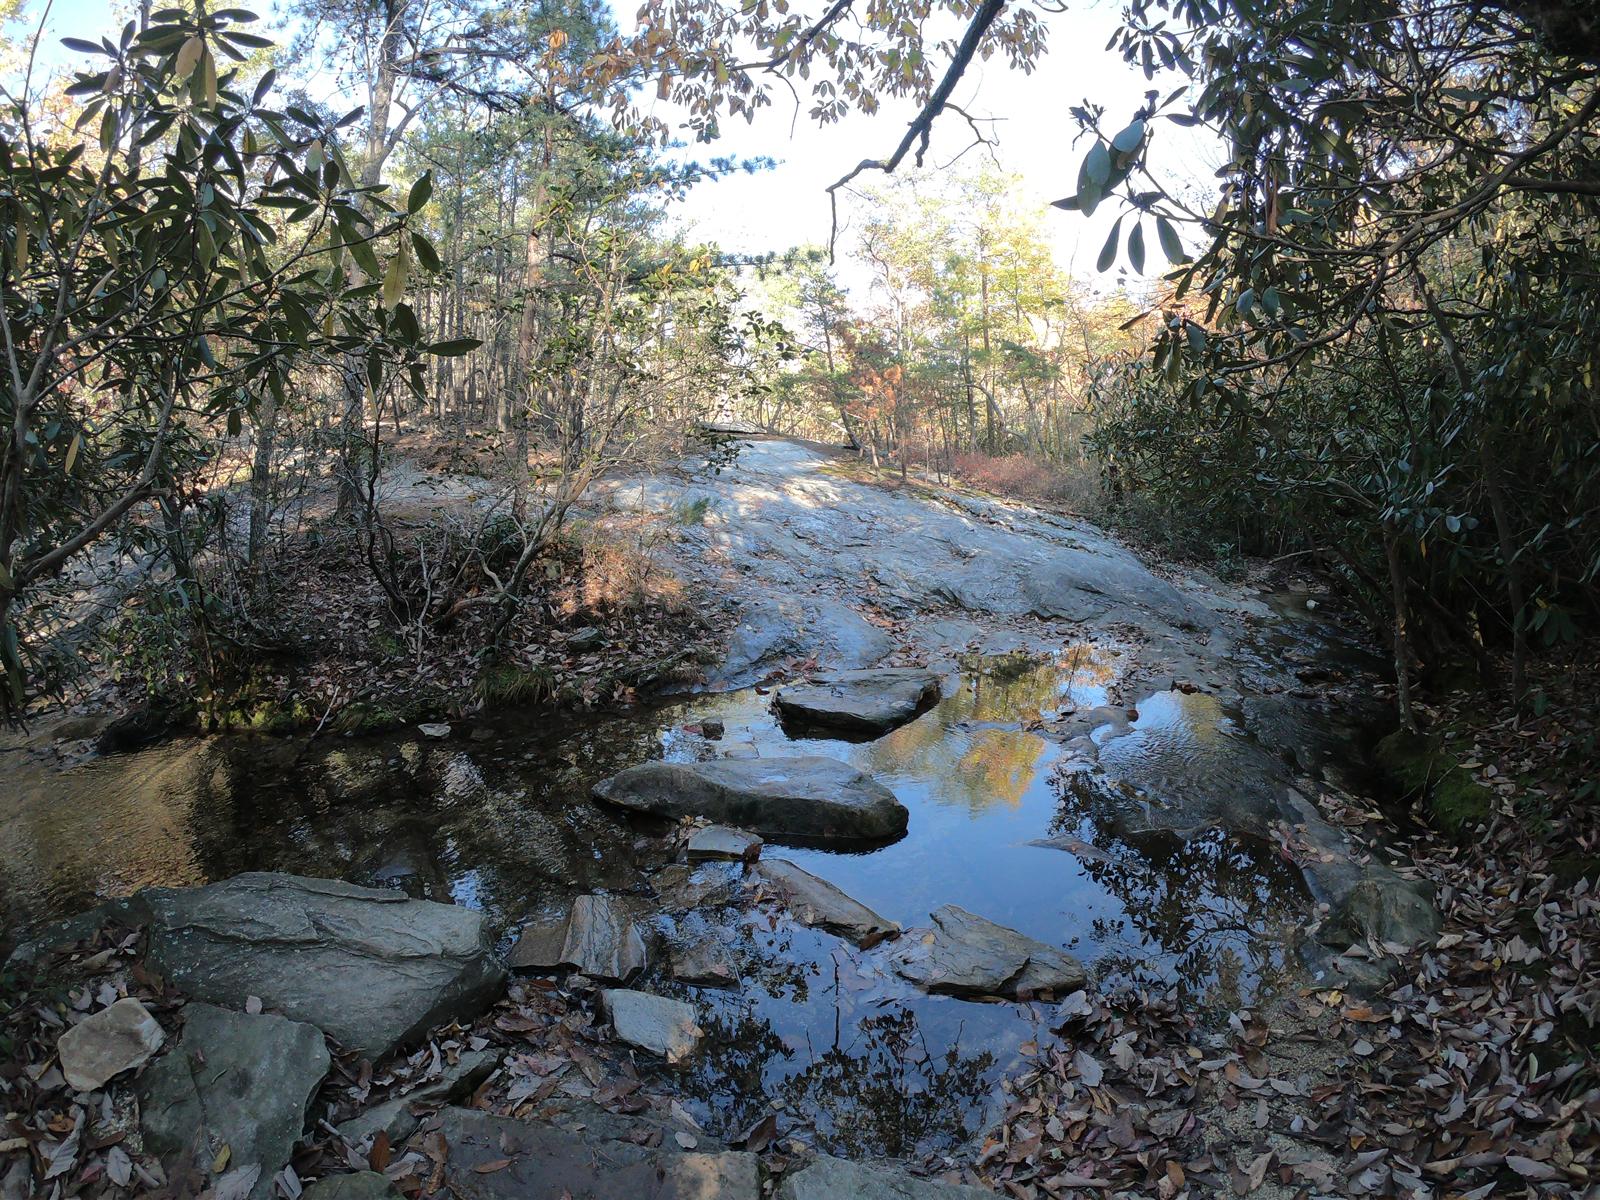 Hiking along the creek in Hanging Rock State Park, North Carolina